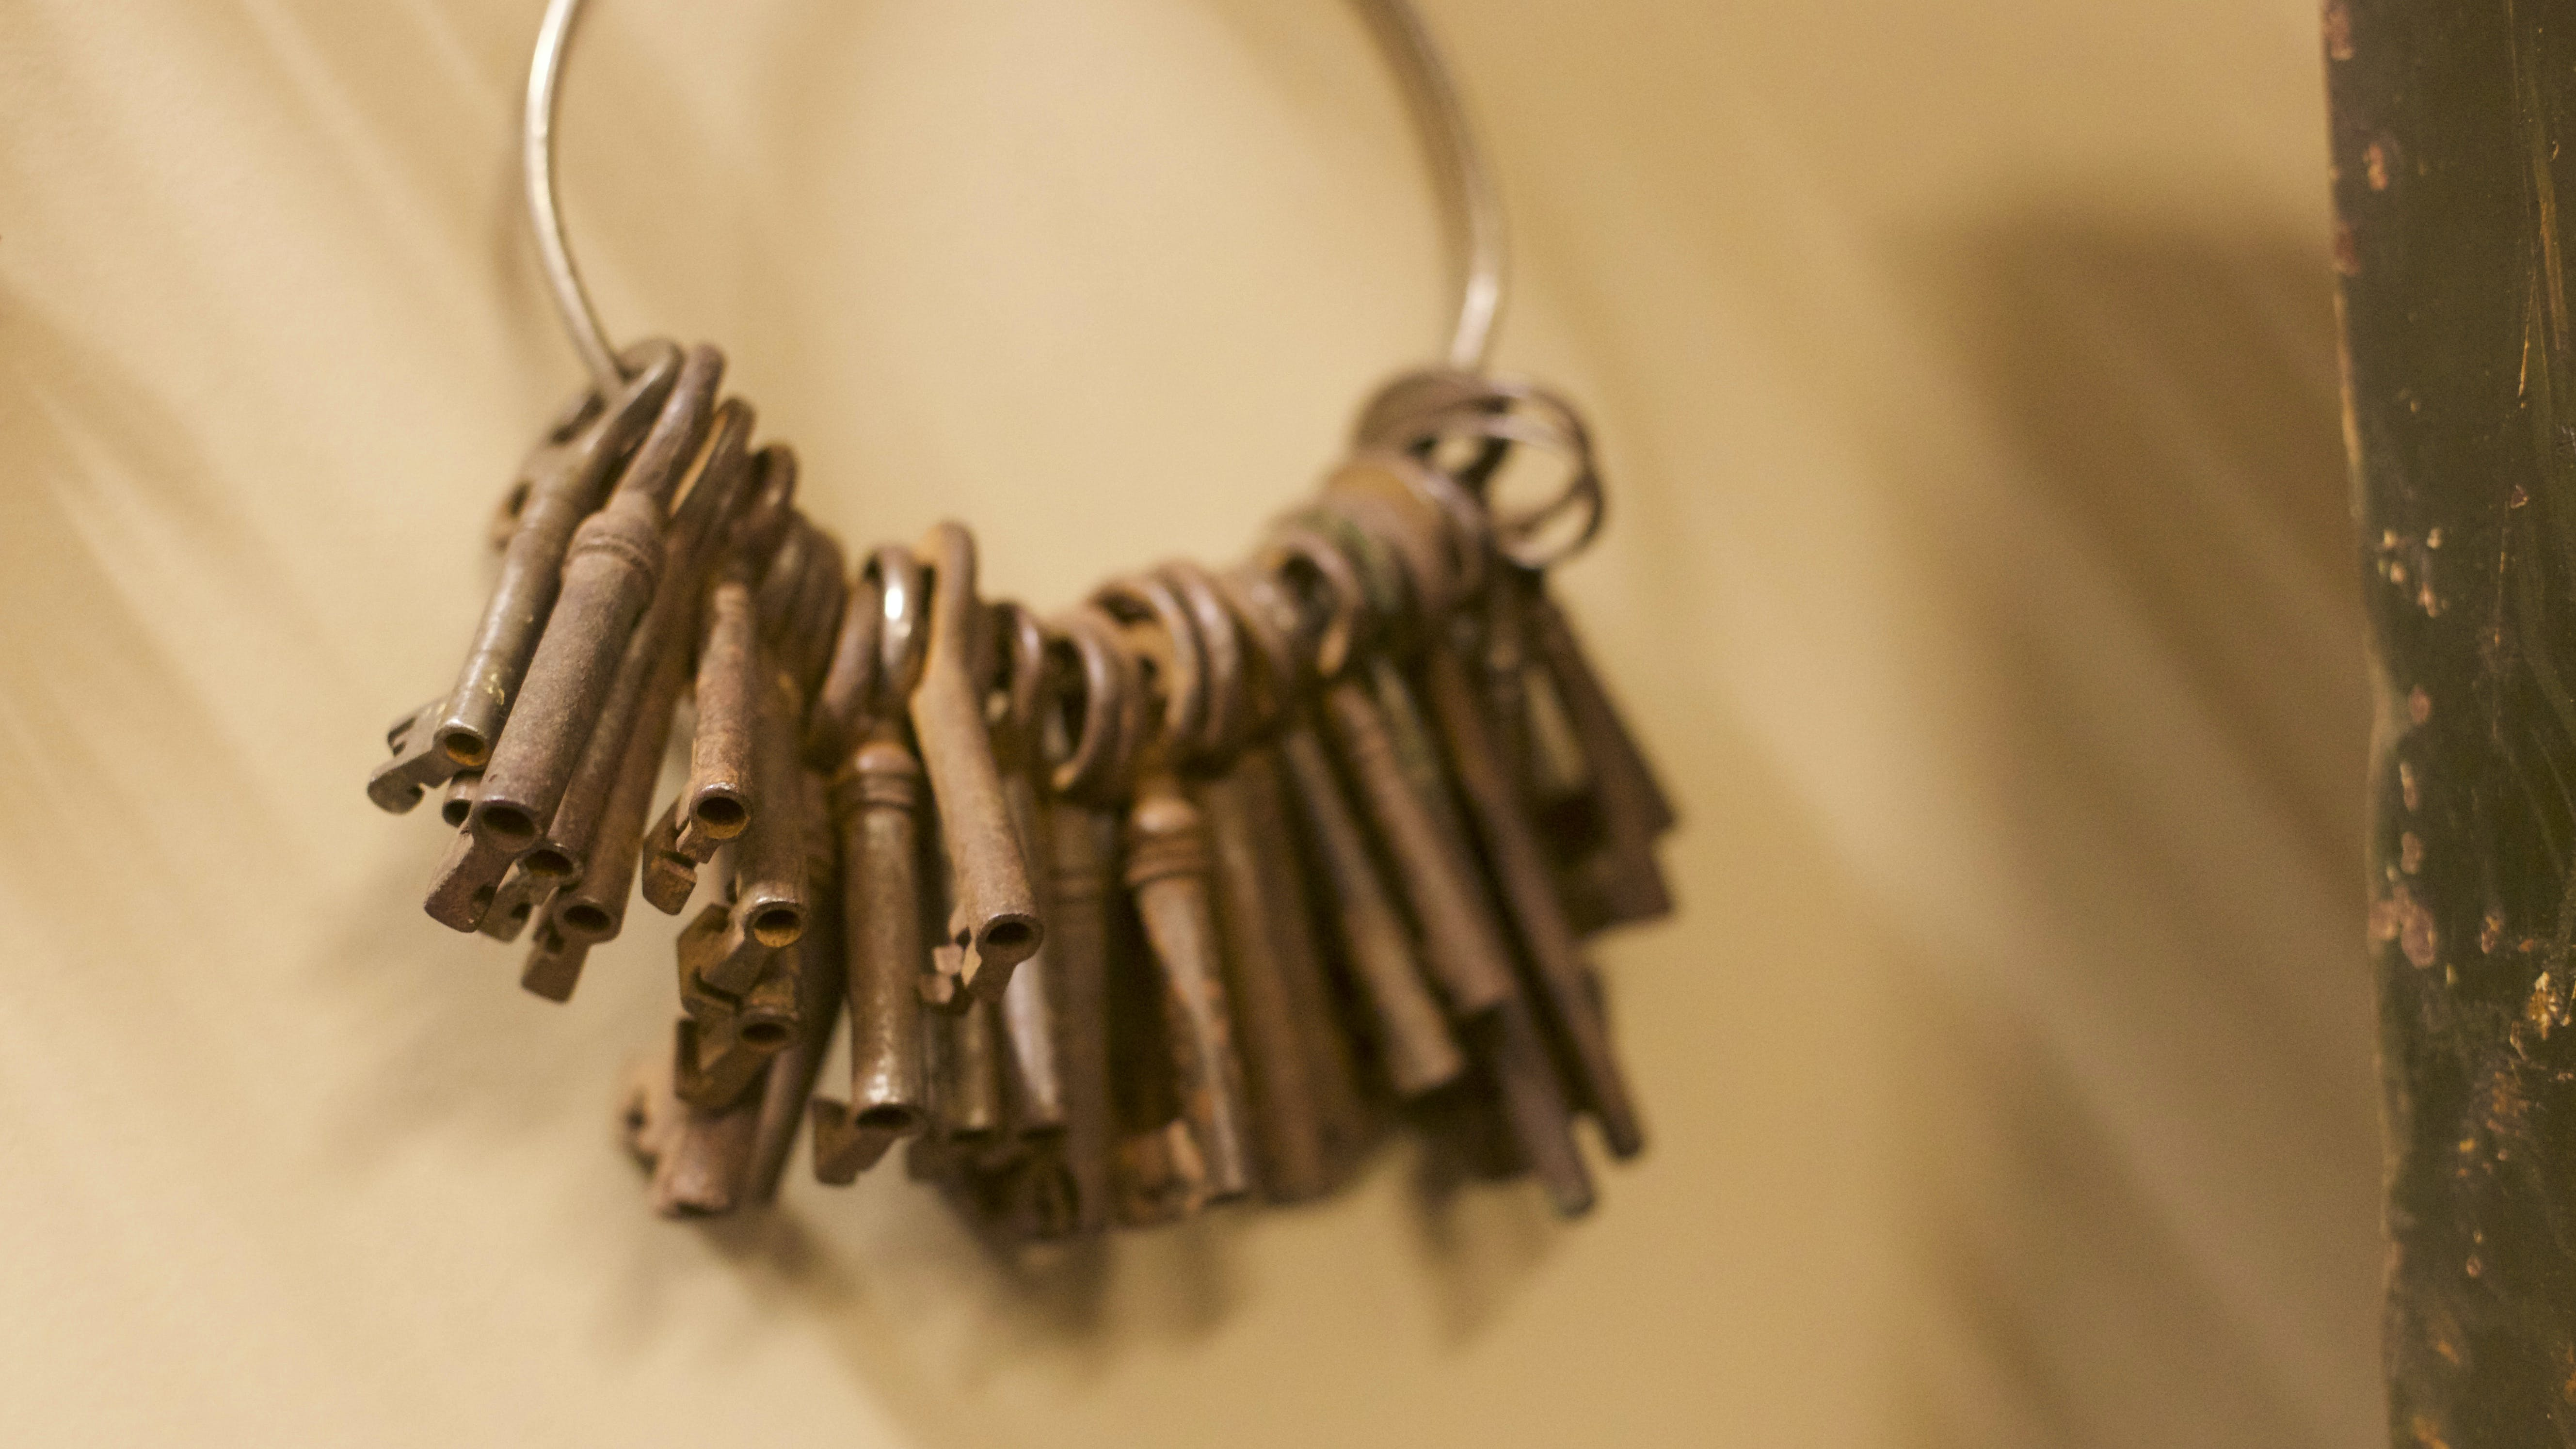 Foto profissional grátis de braun, chaves, foto antiga, matthiaszomer.com